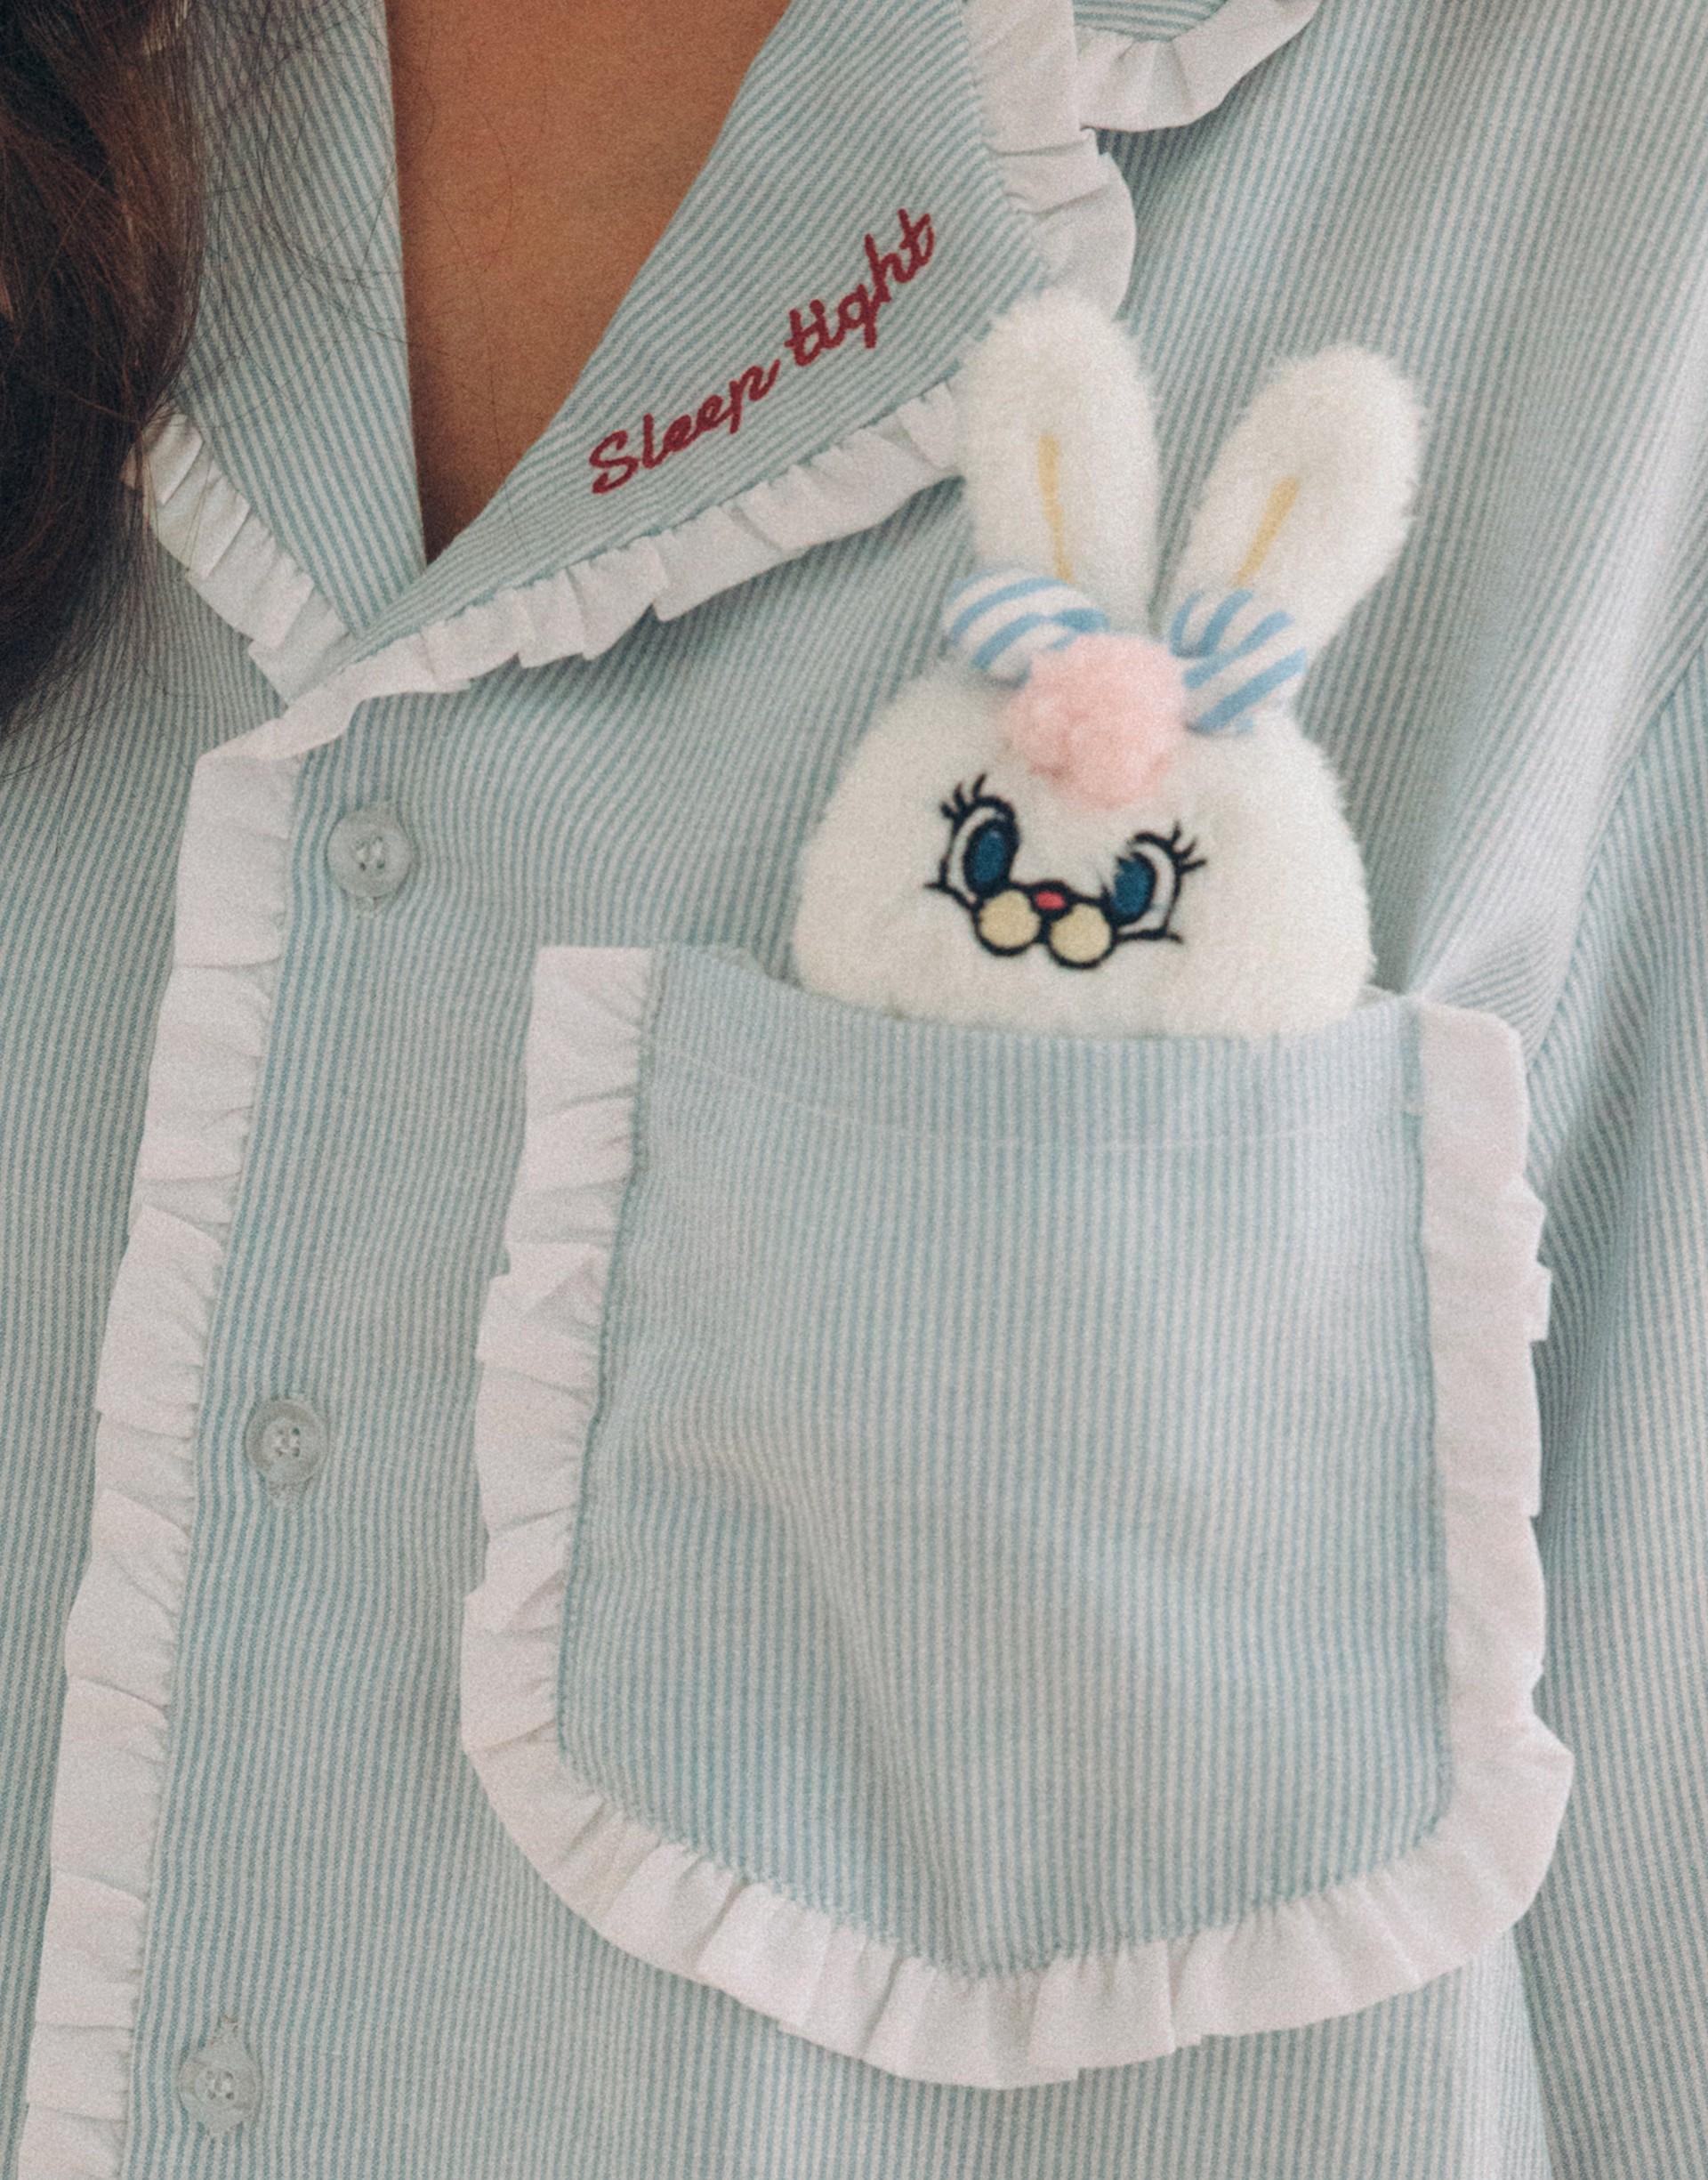 PAZZOXRICO莉可兔聯名企劃/毛茸茸外表/可吊掛於包包上*每個娃娃吊飾尺寸因製作關係略有不同,以實際商品為主